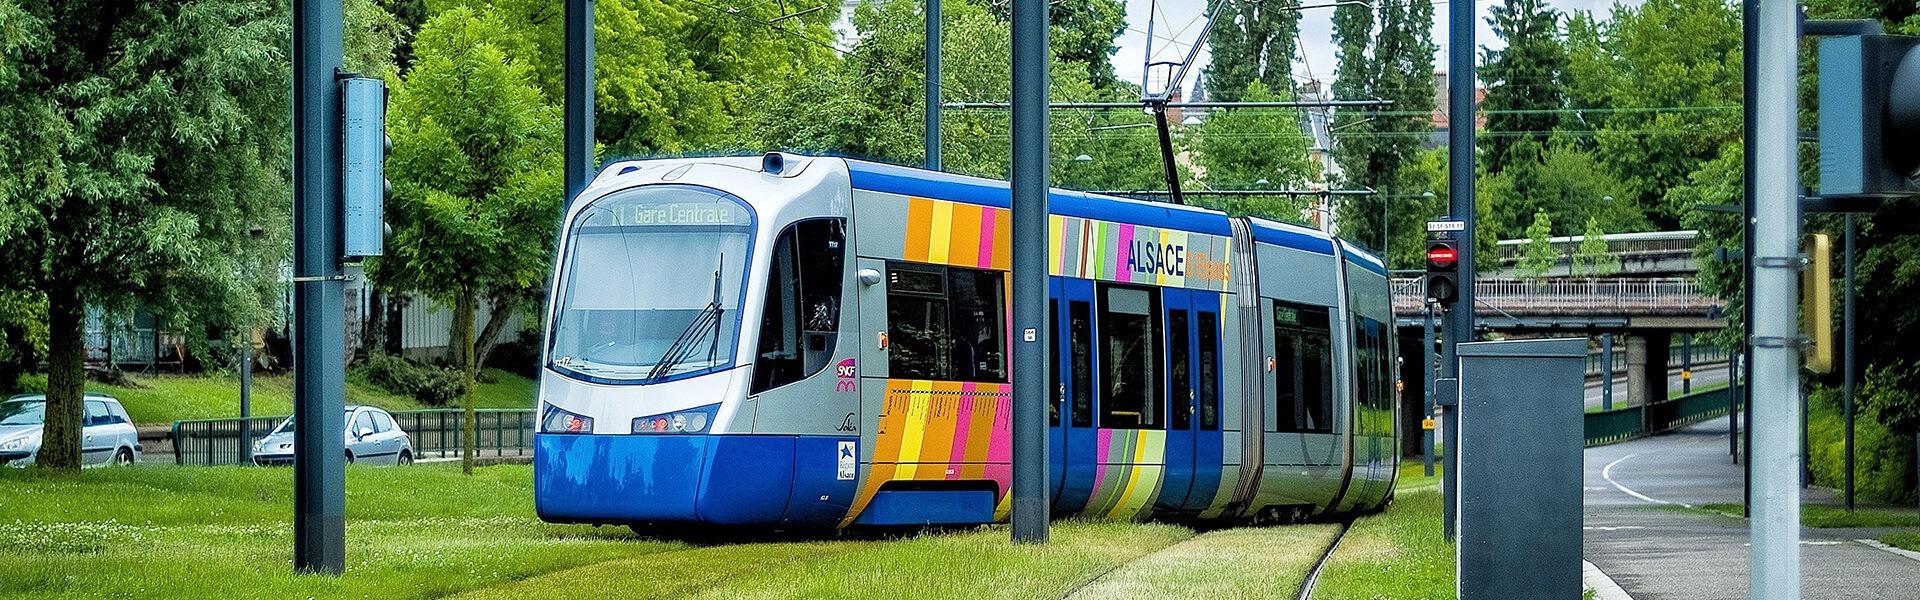 Tram-train Mulhouse